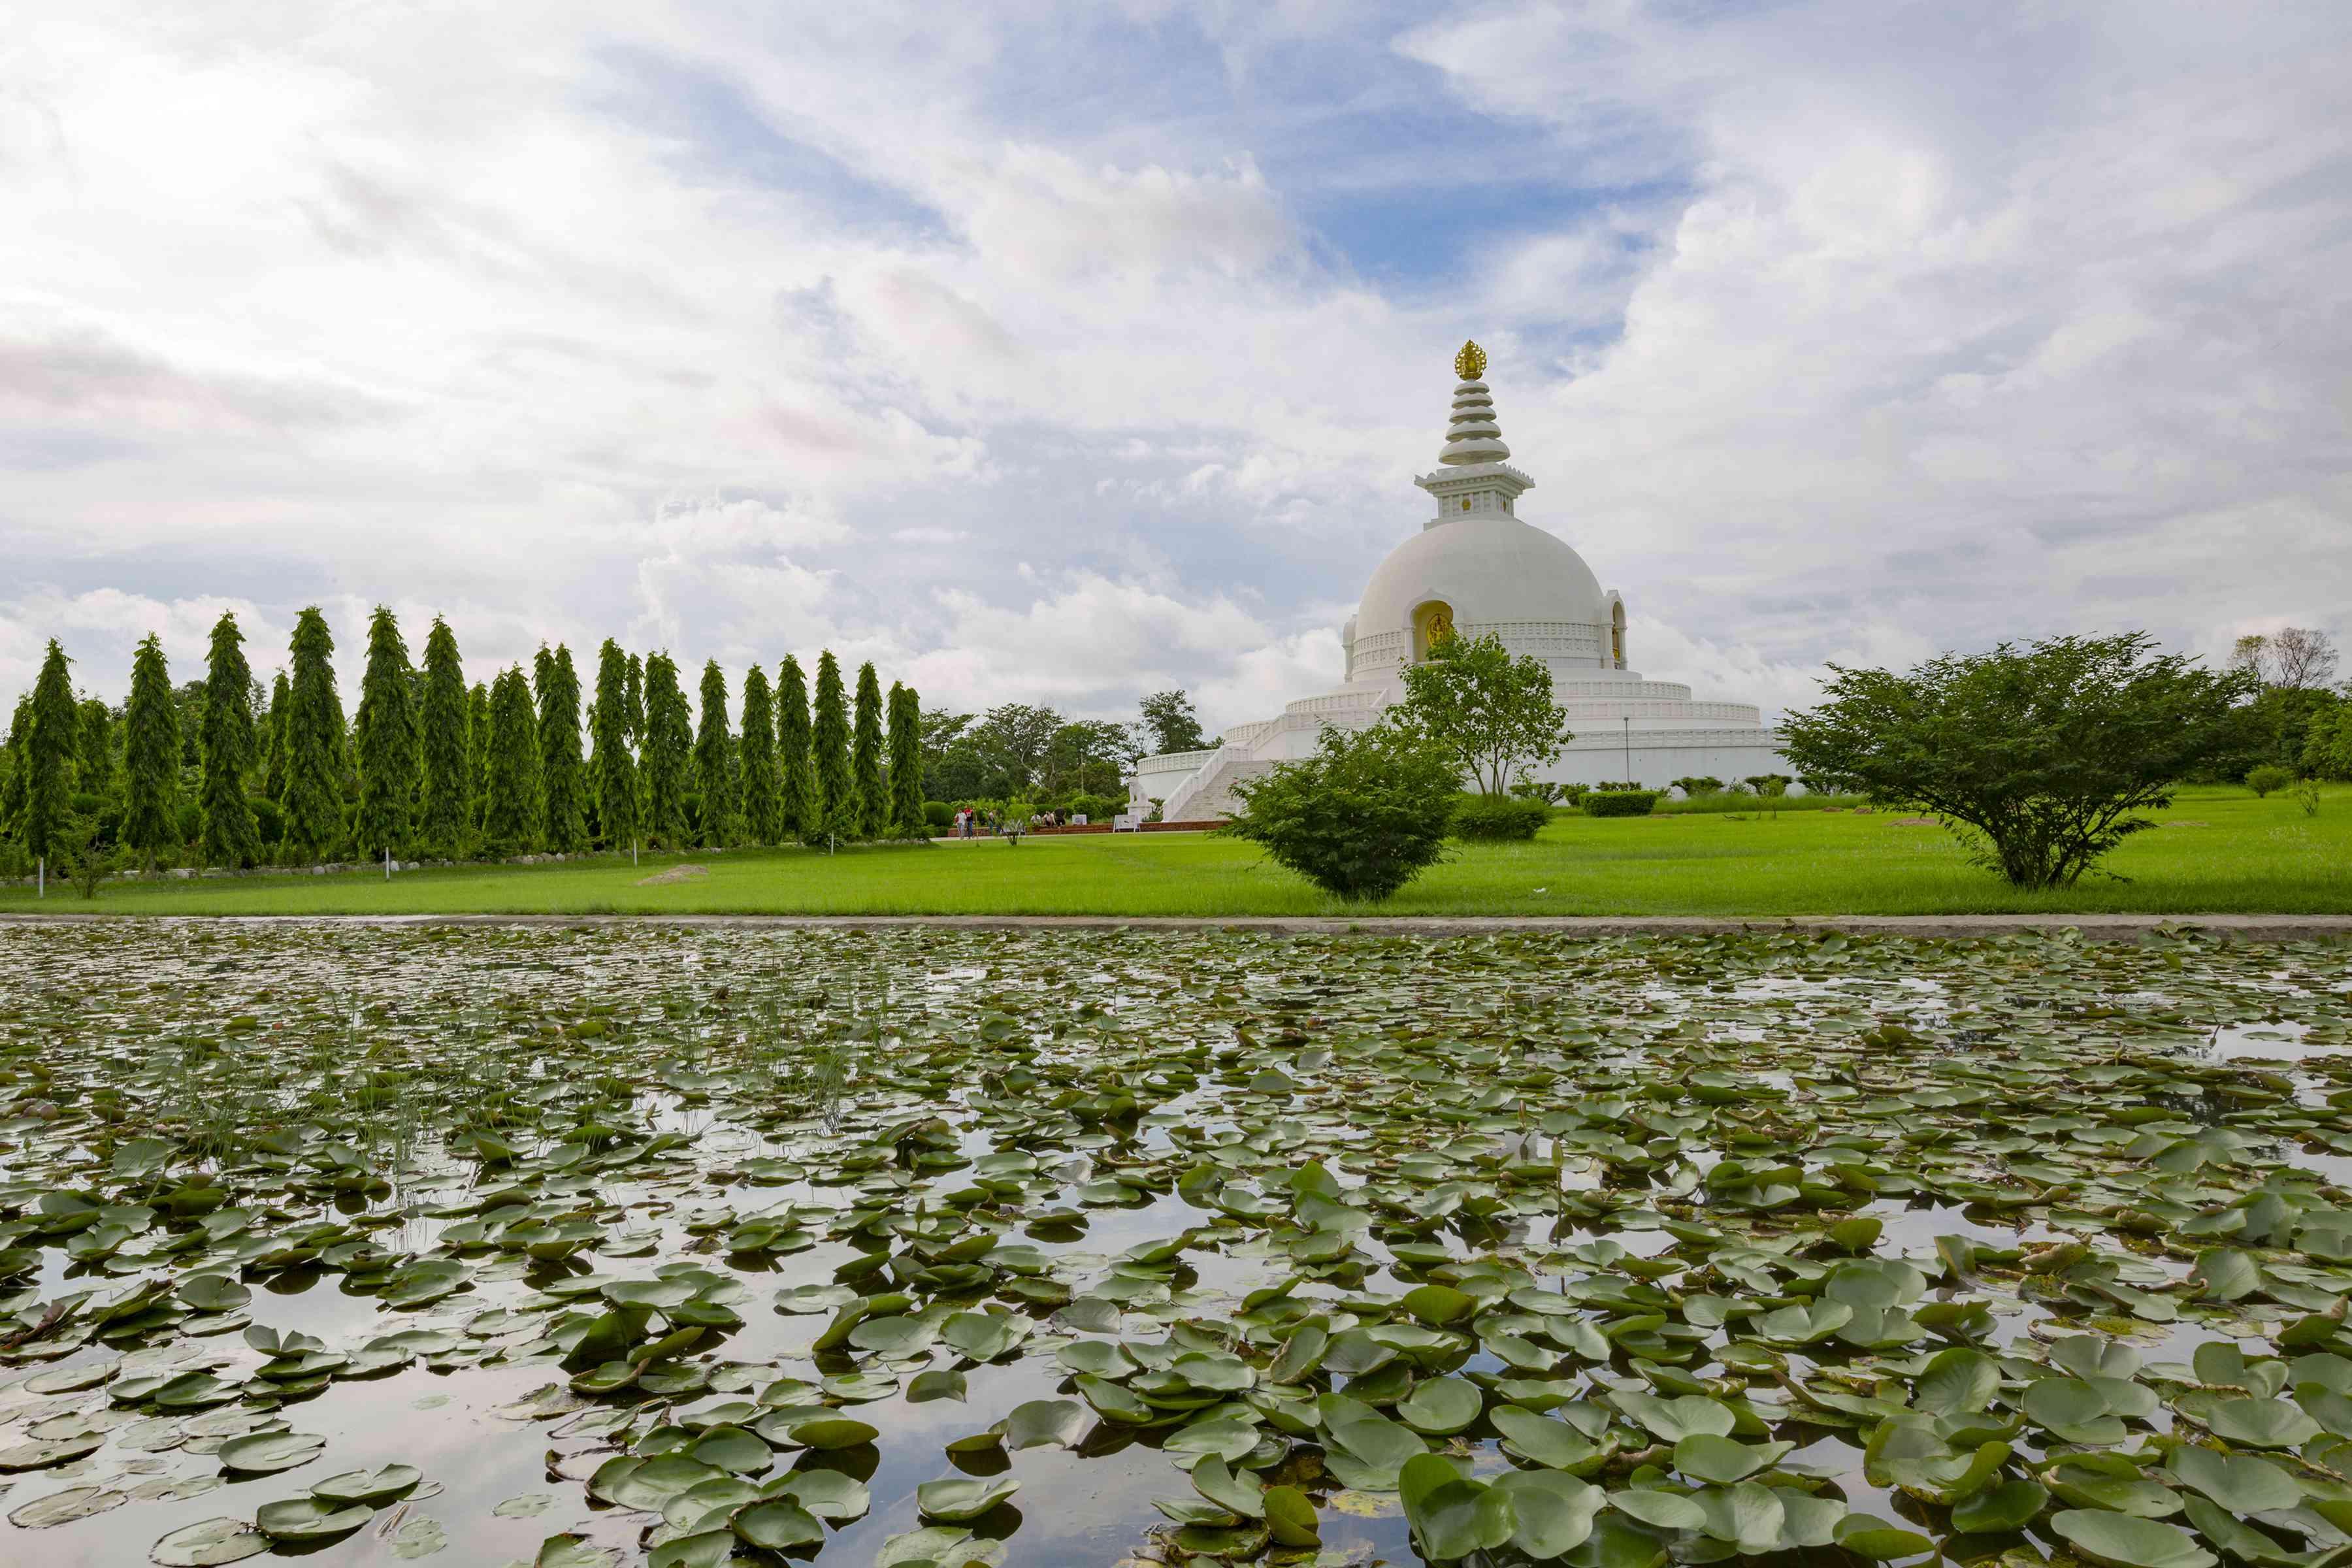 white Buddhist stupa behind a lily pond